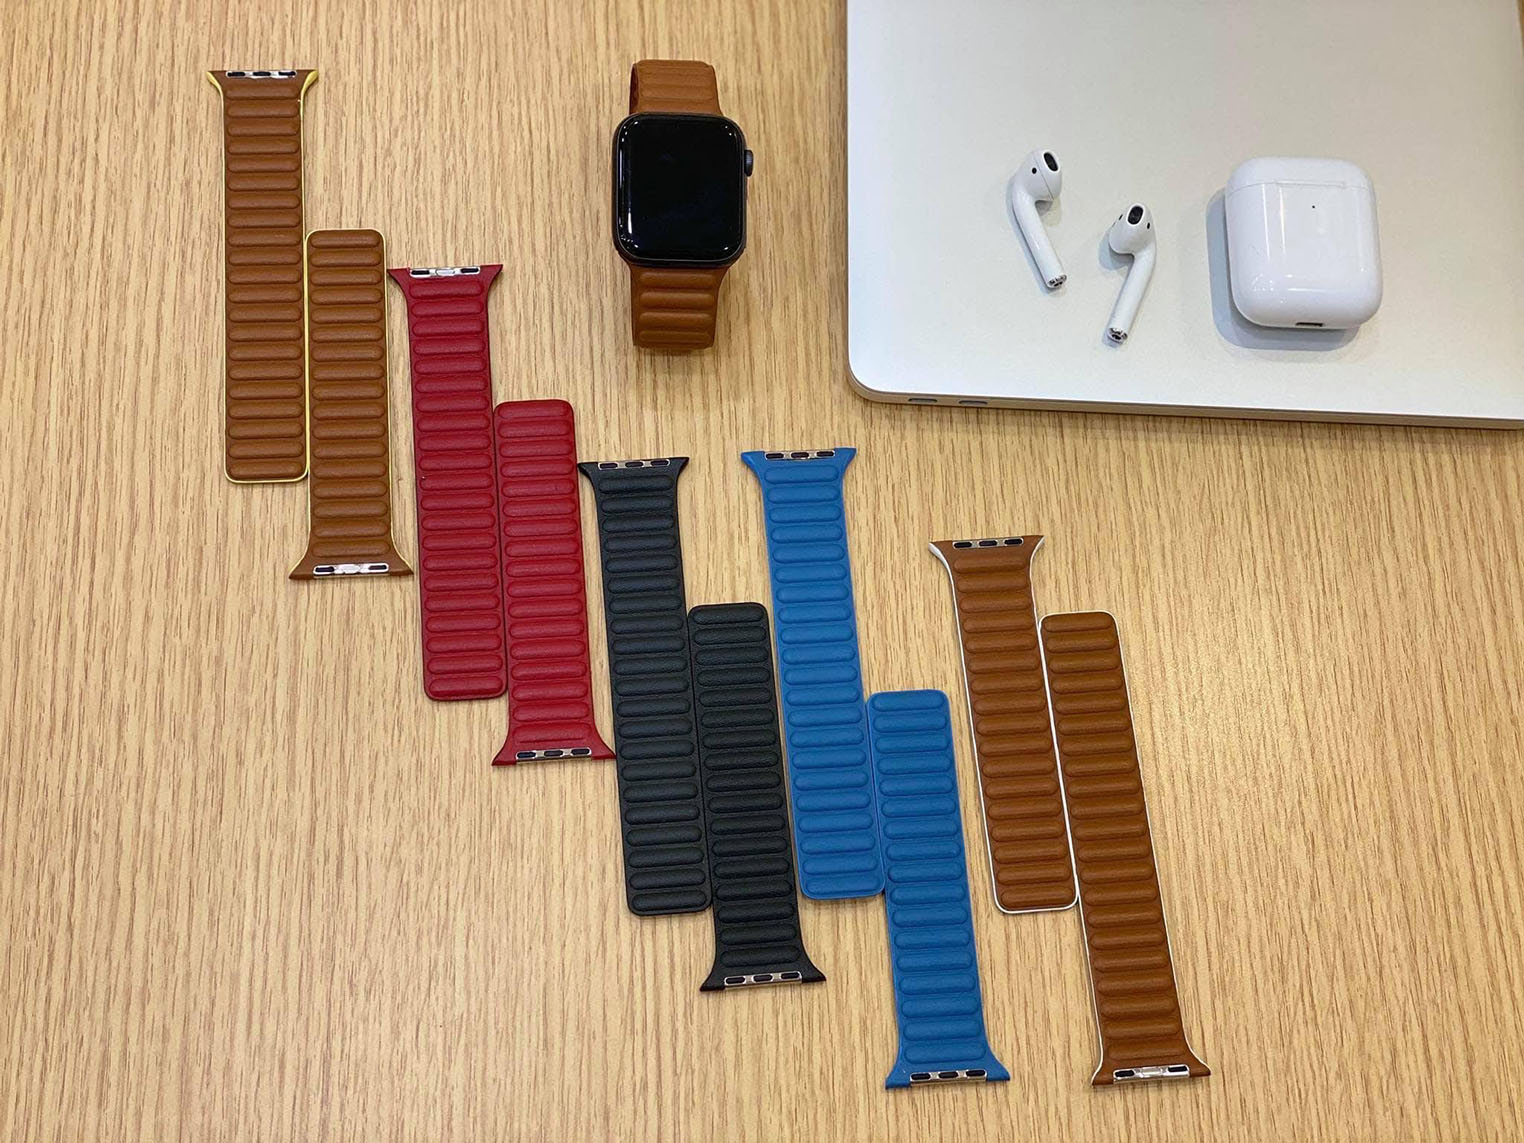 Bracelets cuir Apple Watch 2020 fuite